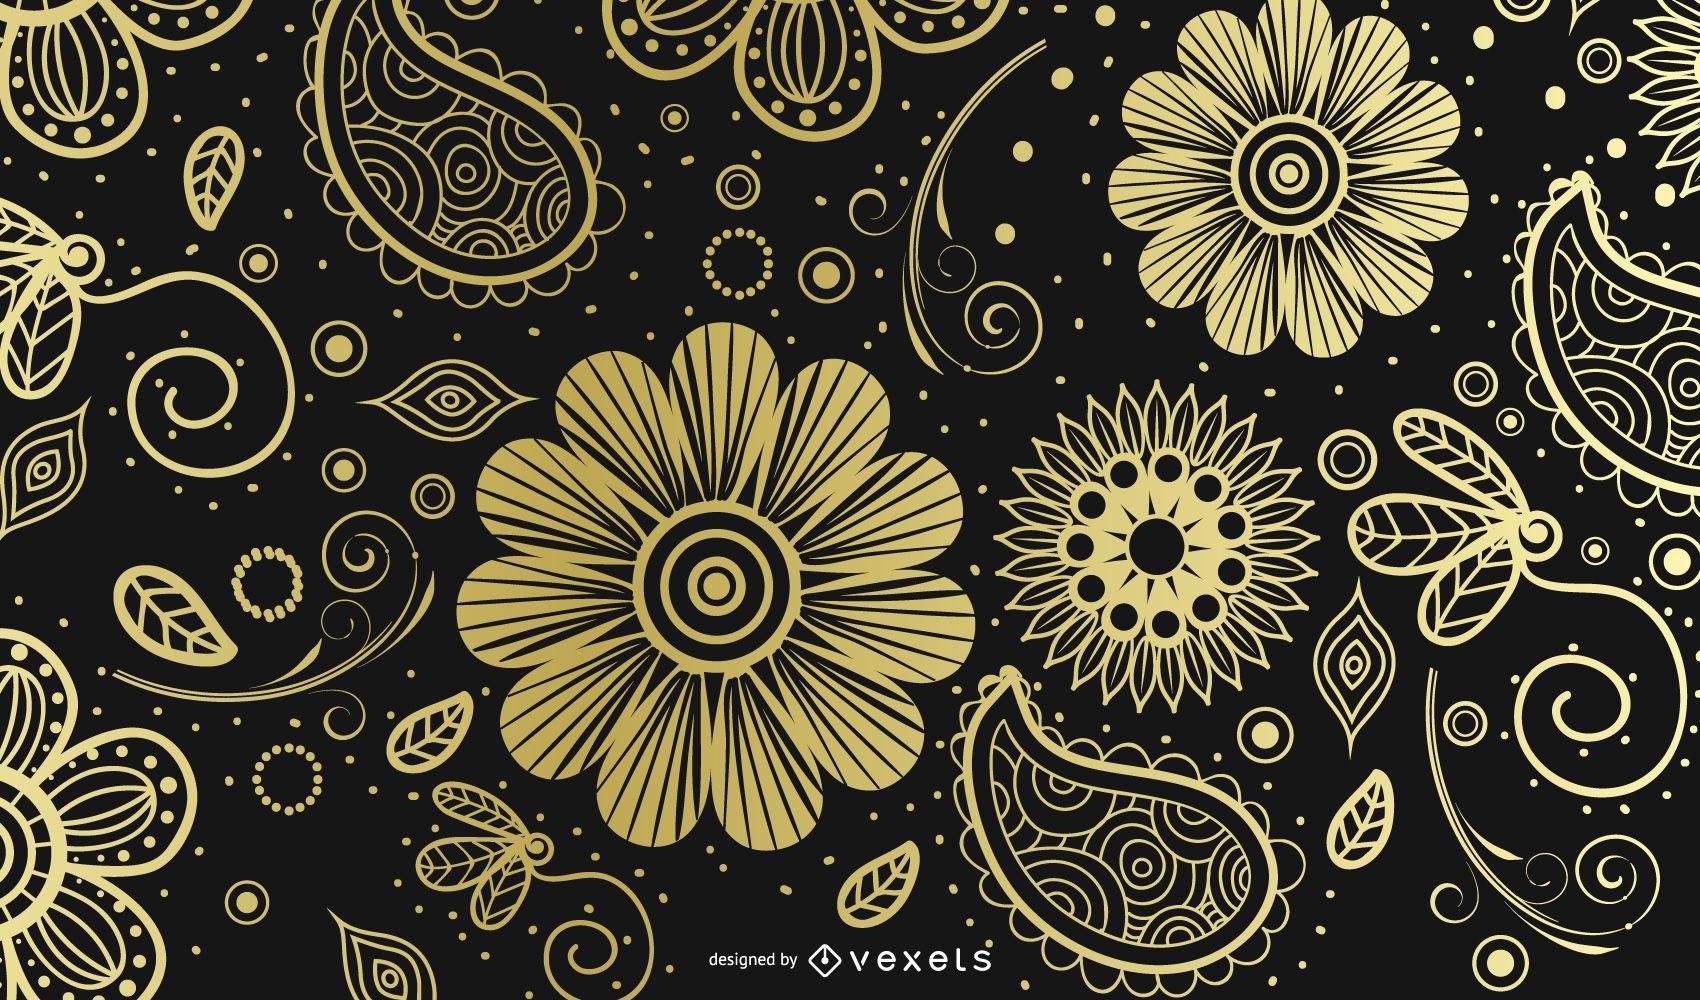 Golden Paisley Ornamental Background